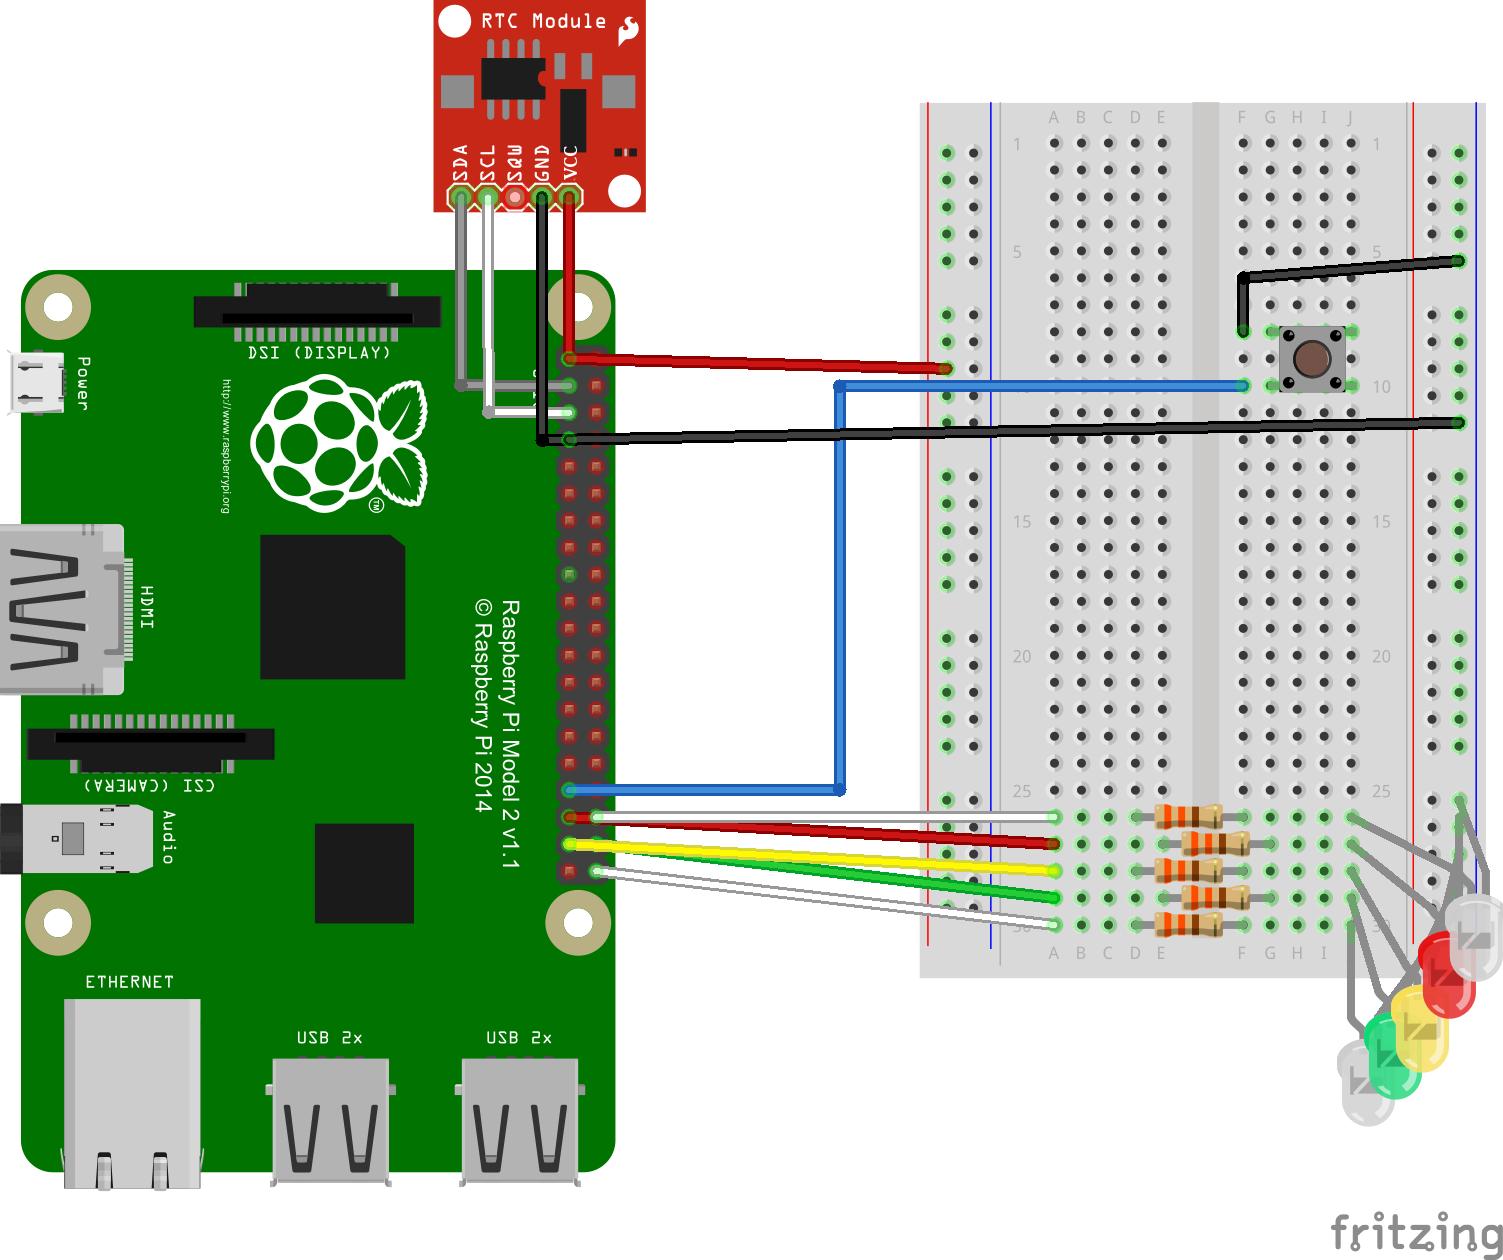 Basic GPIO on the Raspberry Pi